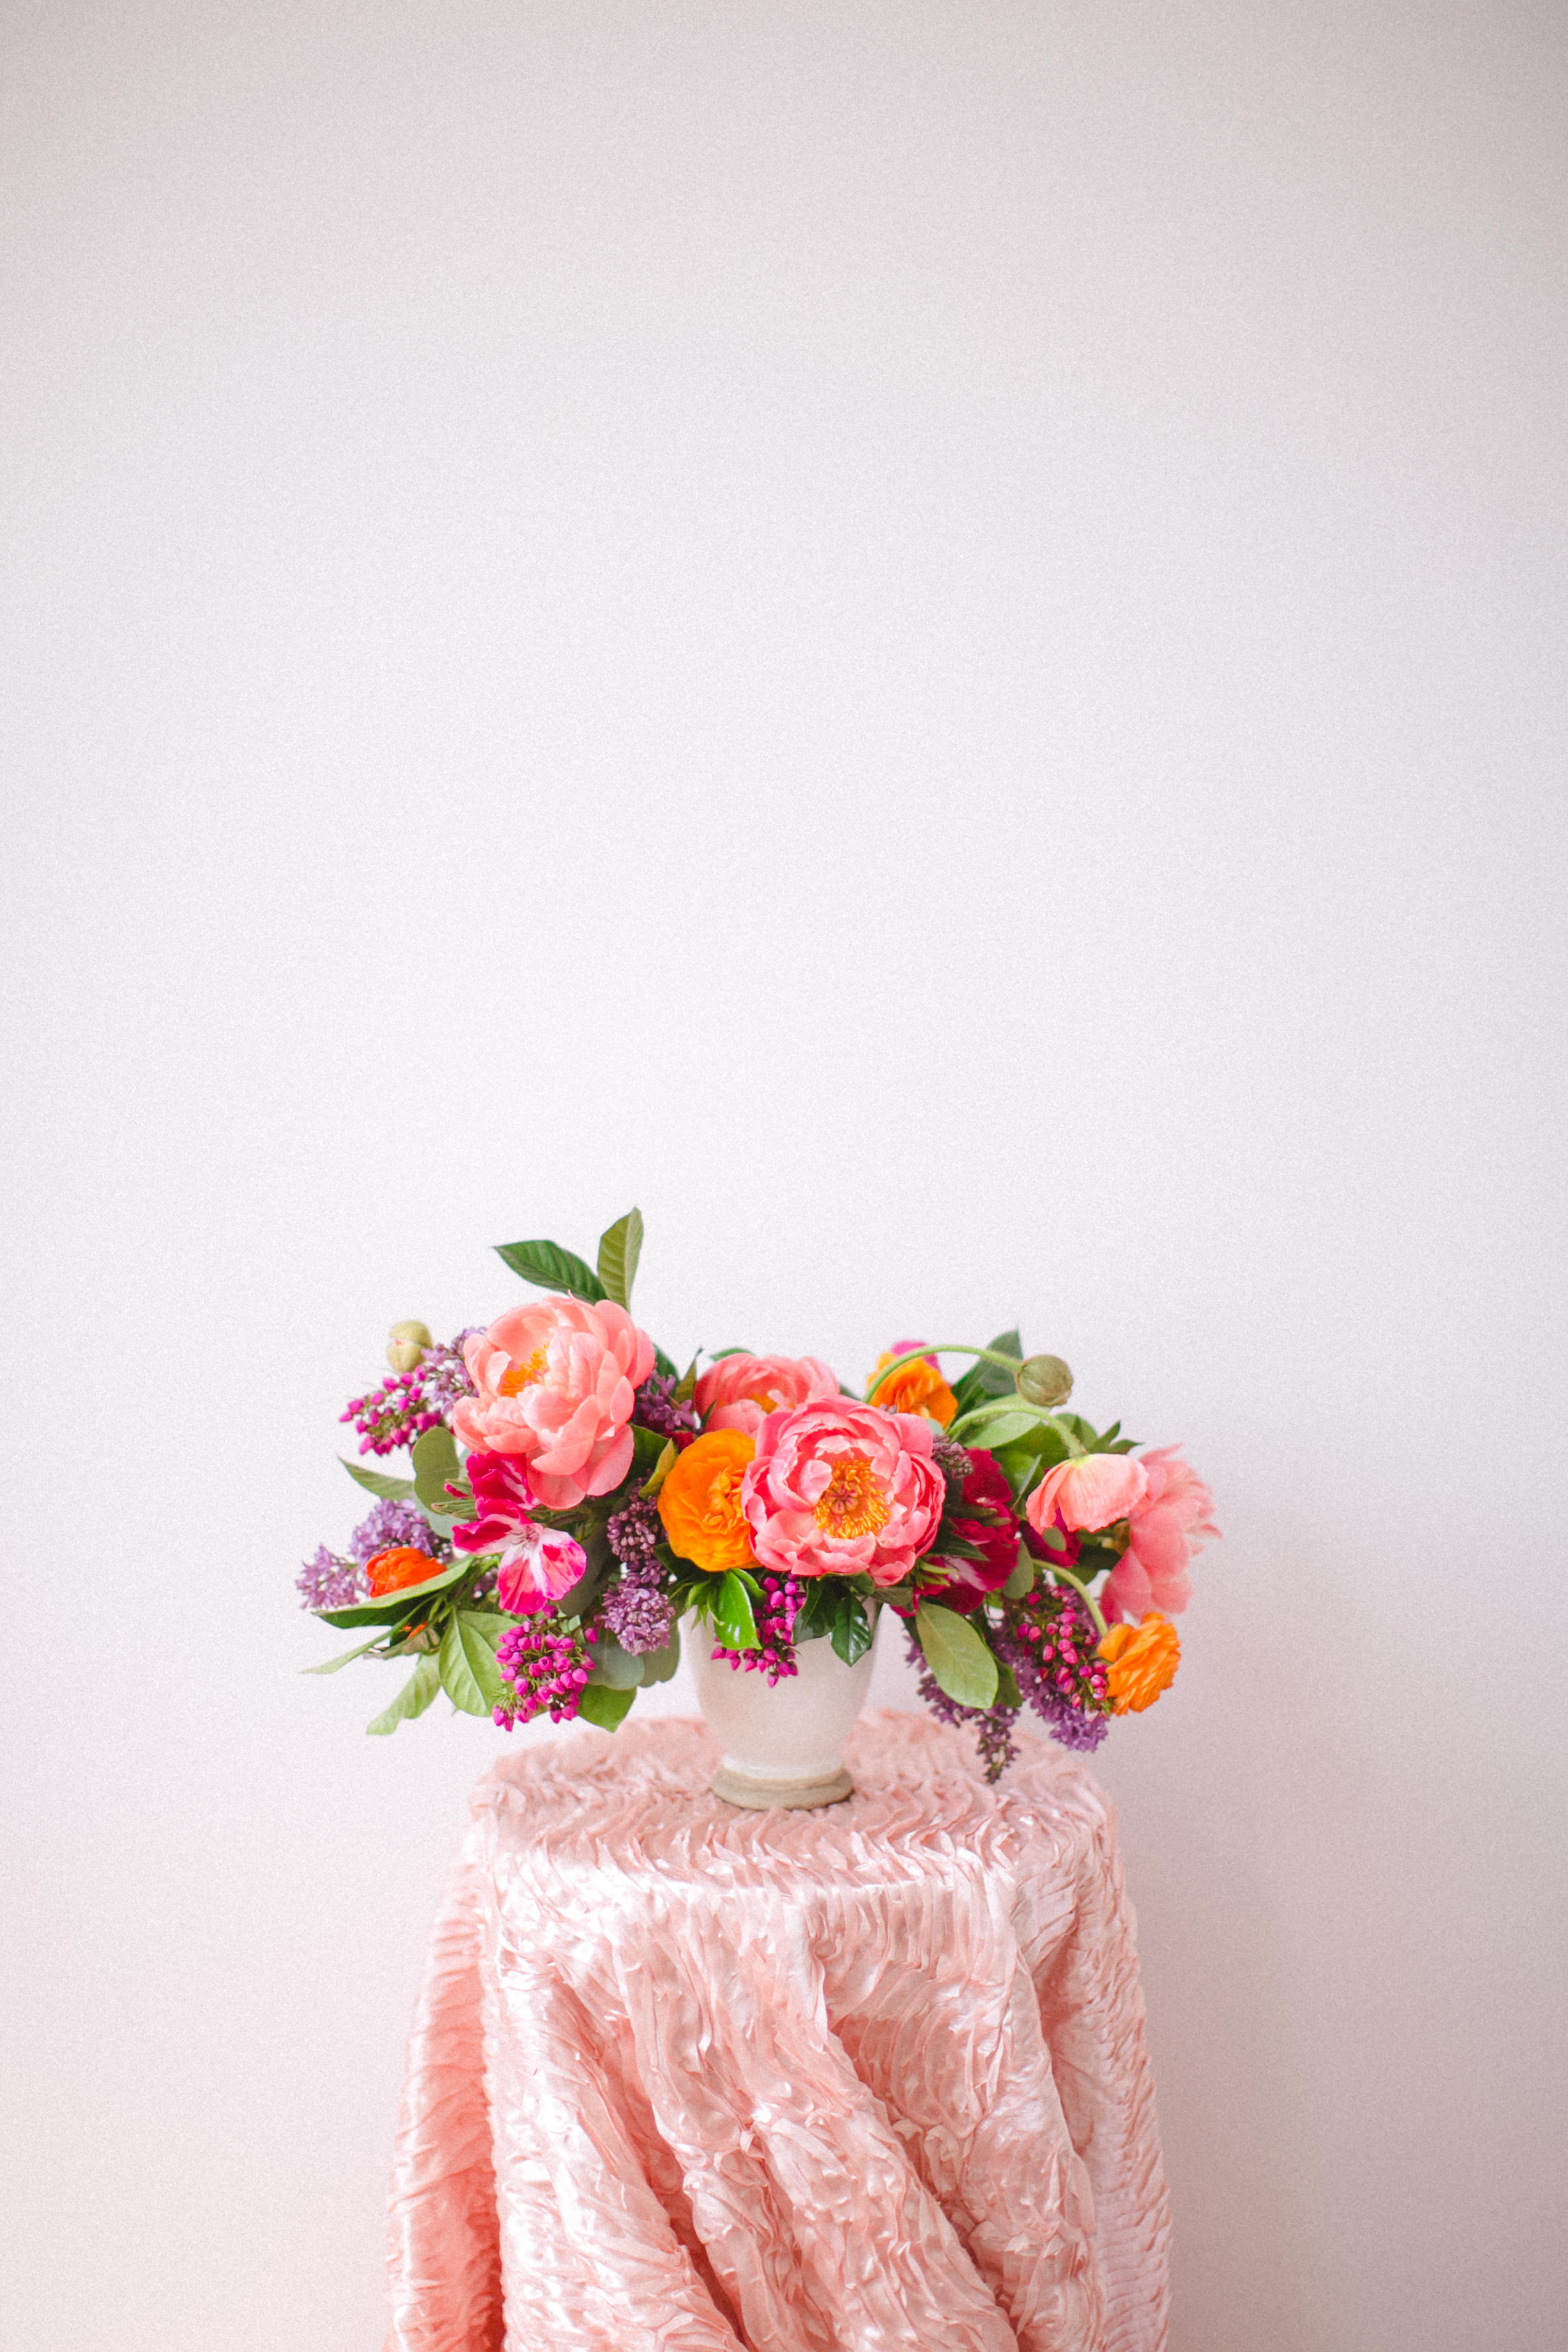 by Aimee Jobe Colorful Arrangement Wedding Bouquet Centerpiece-2.jpg